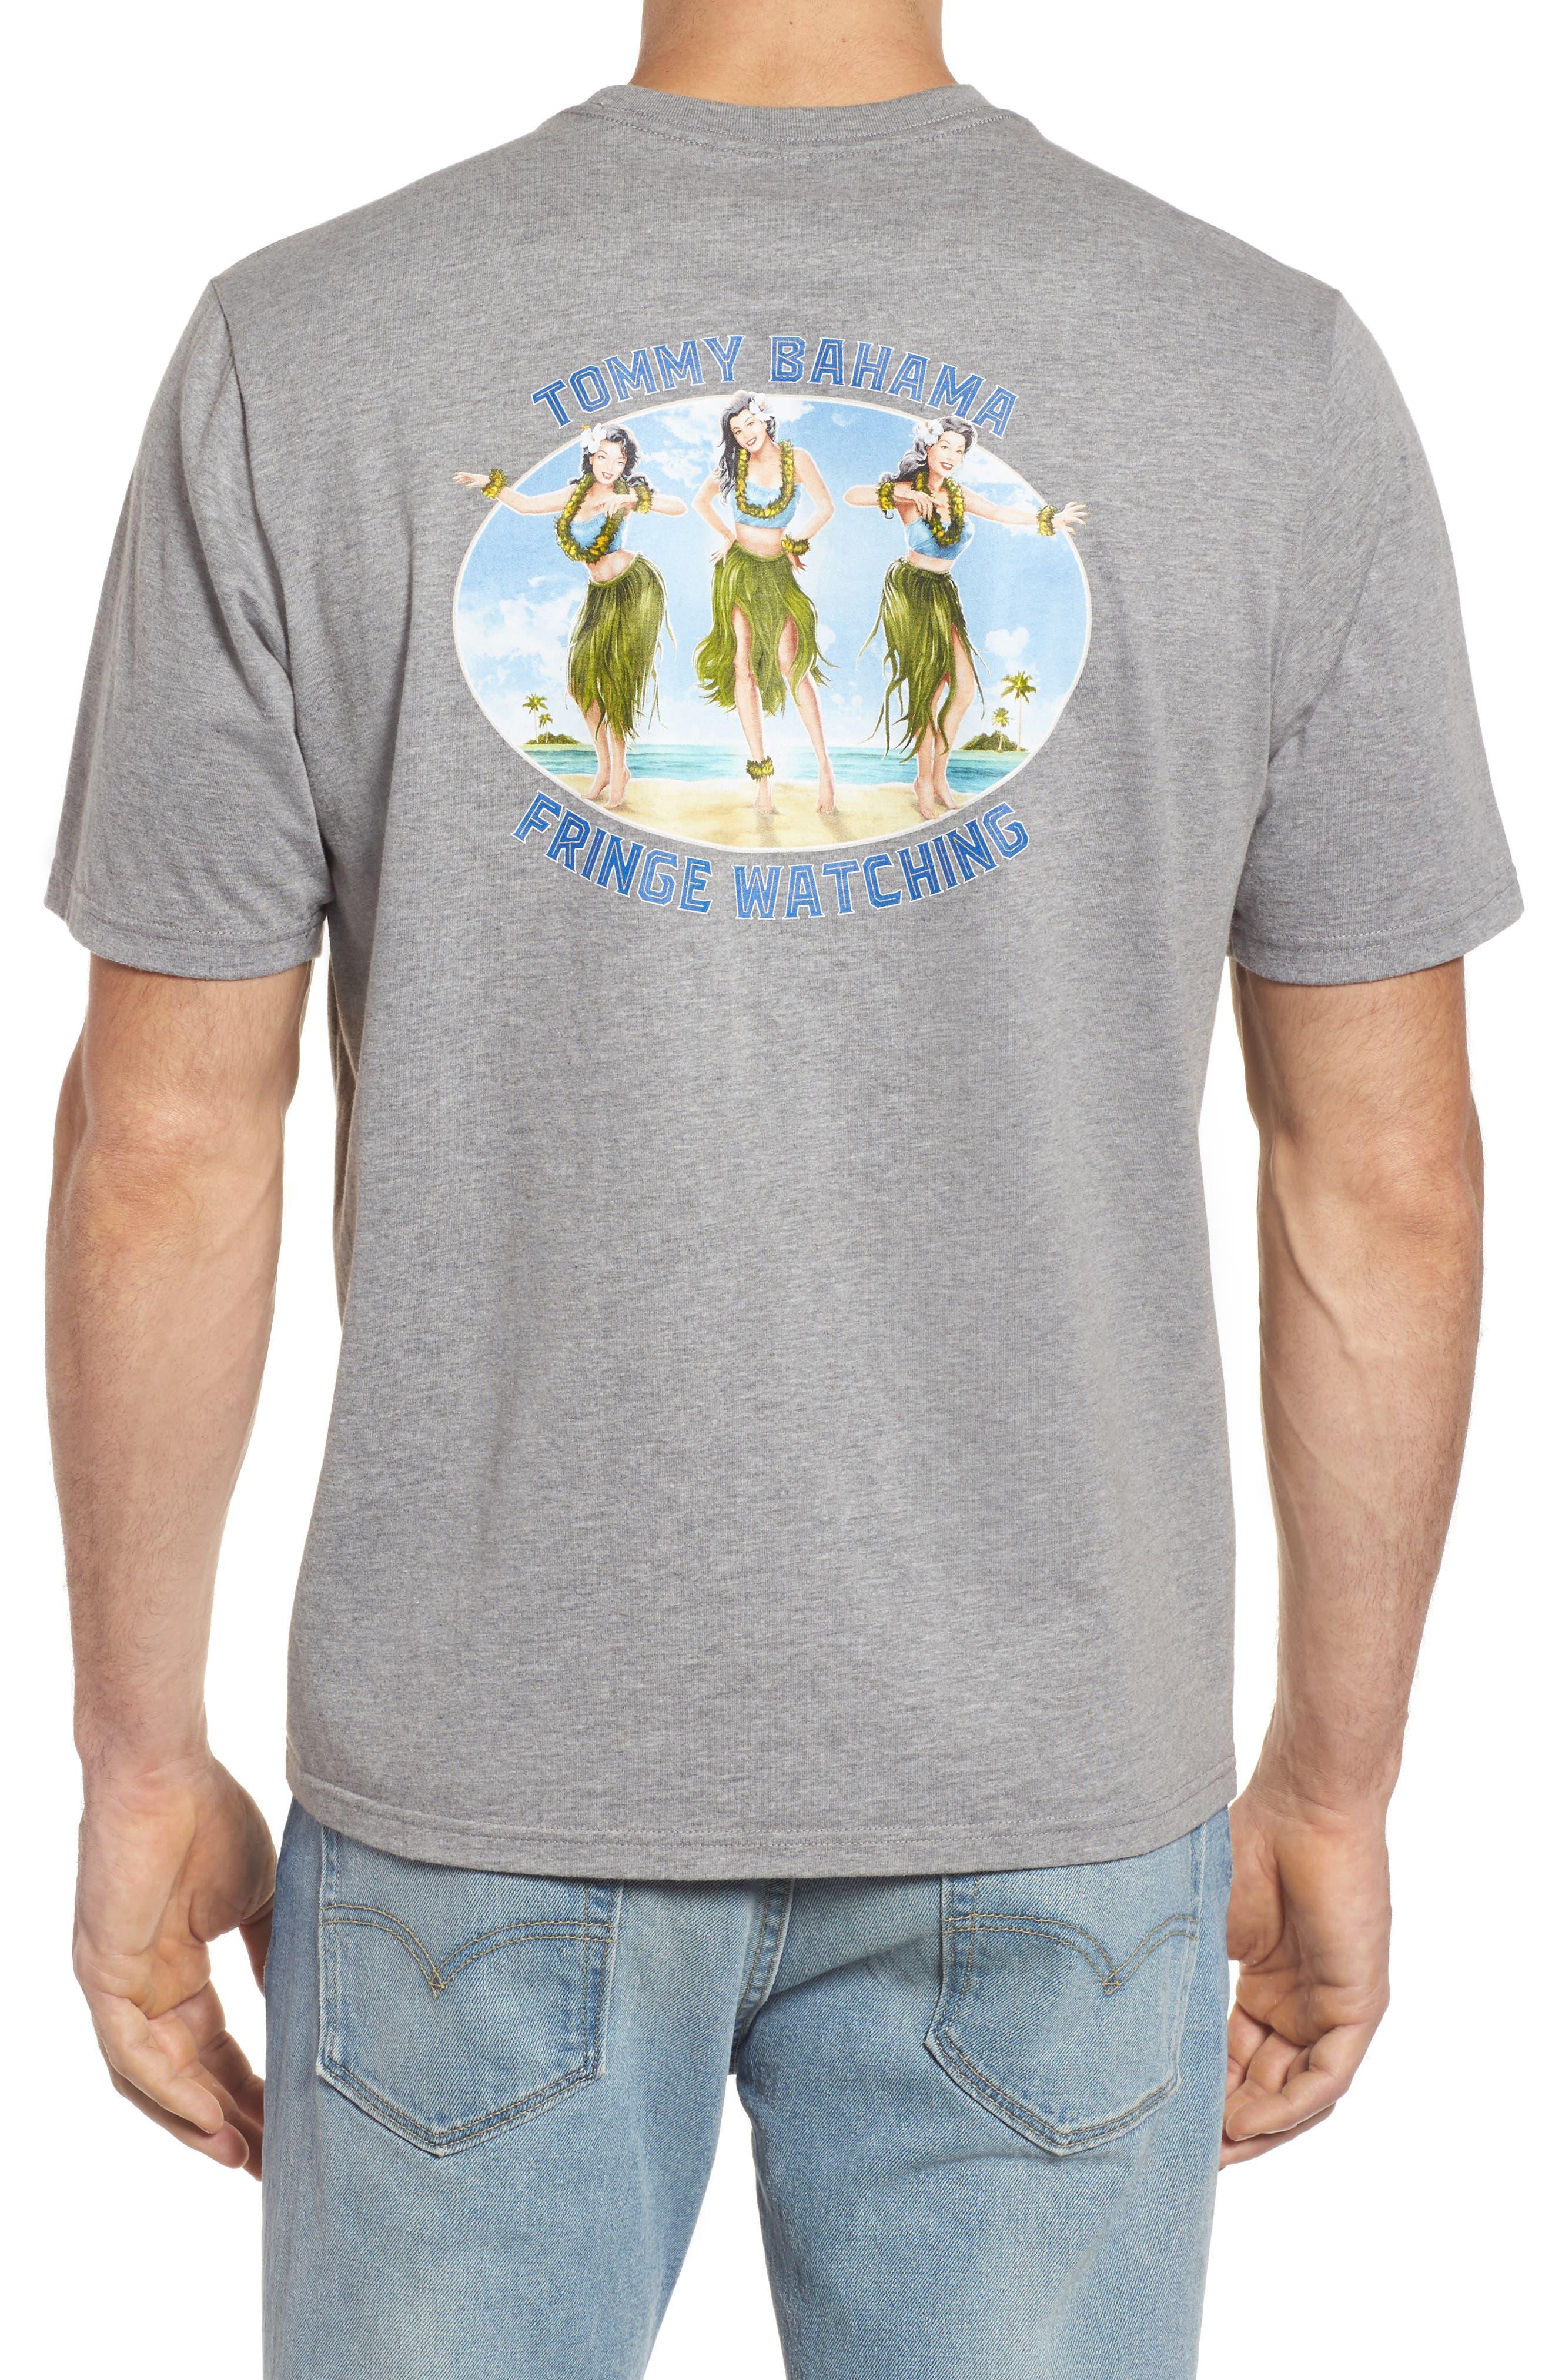 Tommy Bahama Fringe Watching Graphic T-Shirt